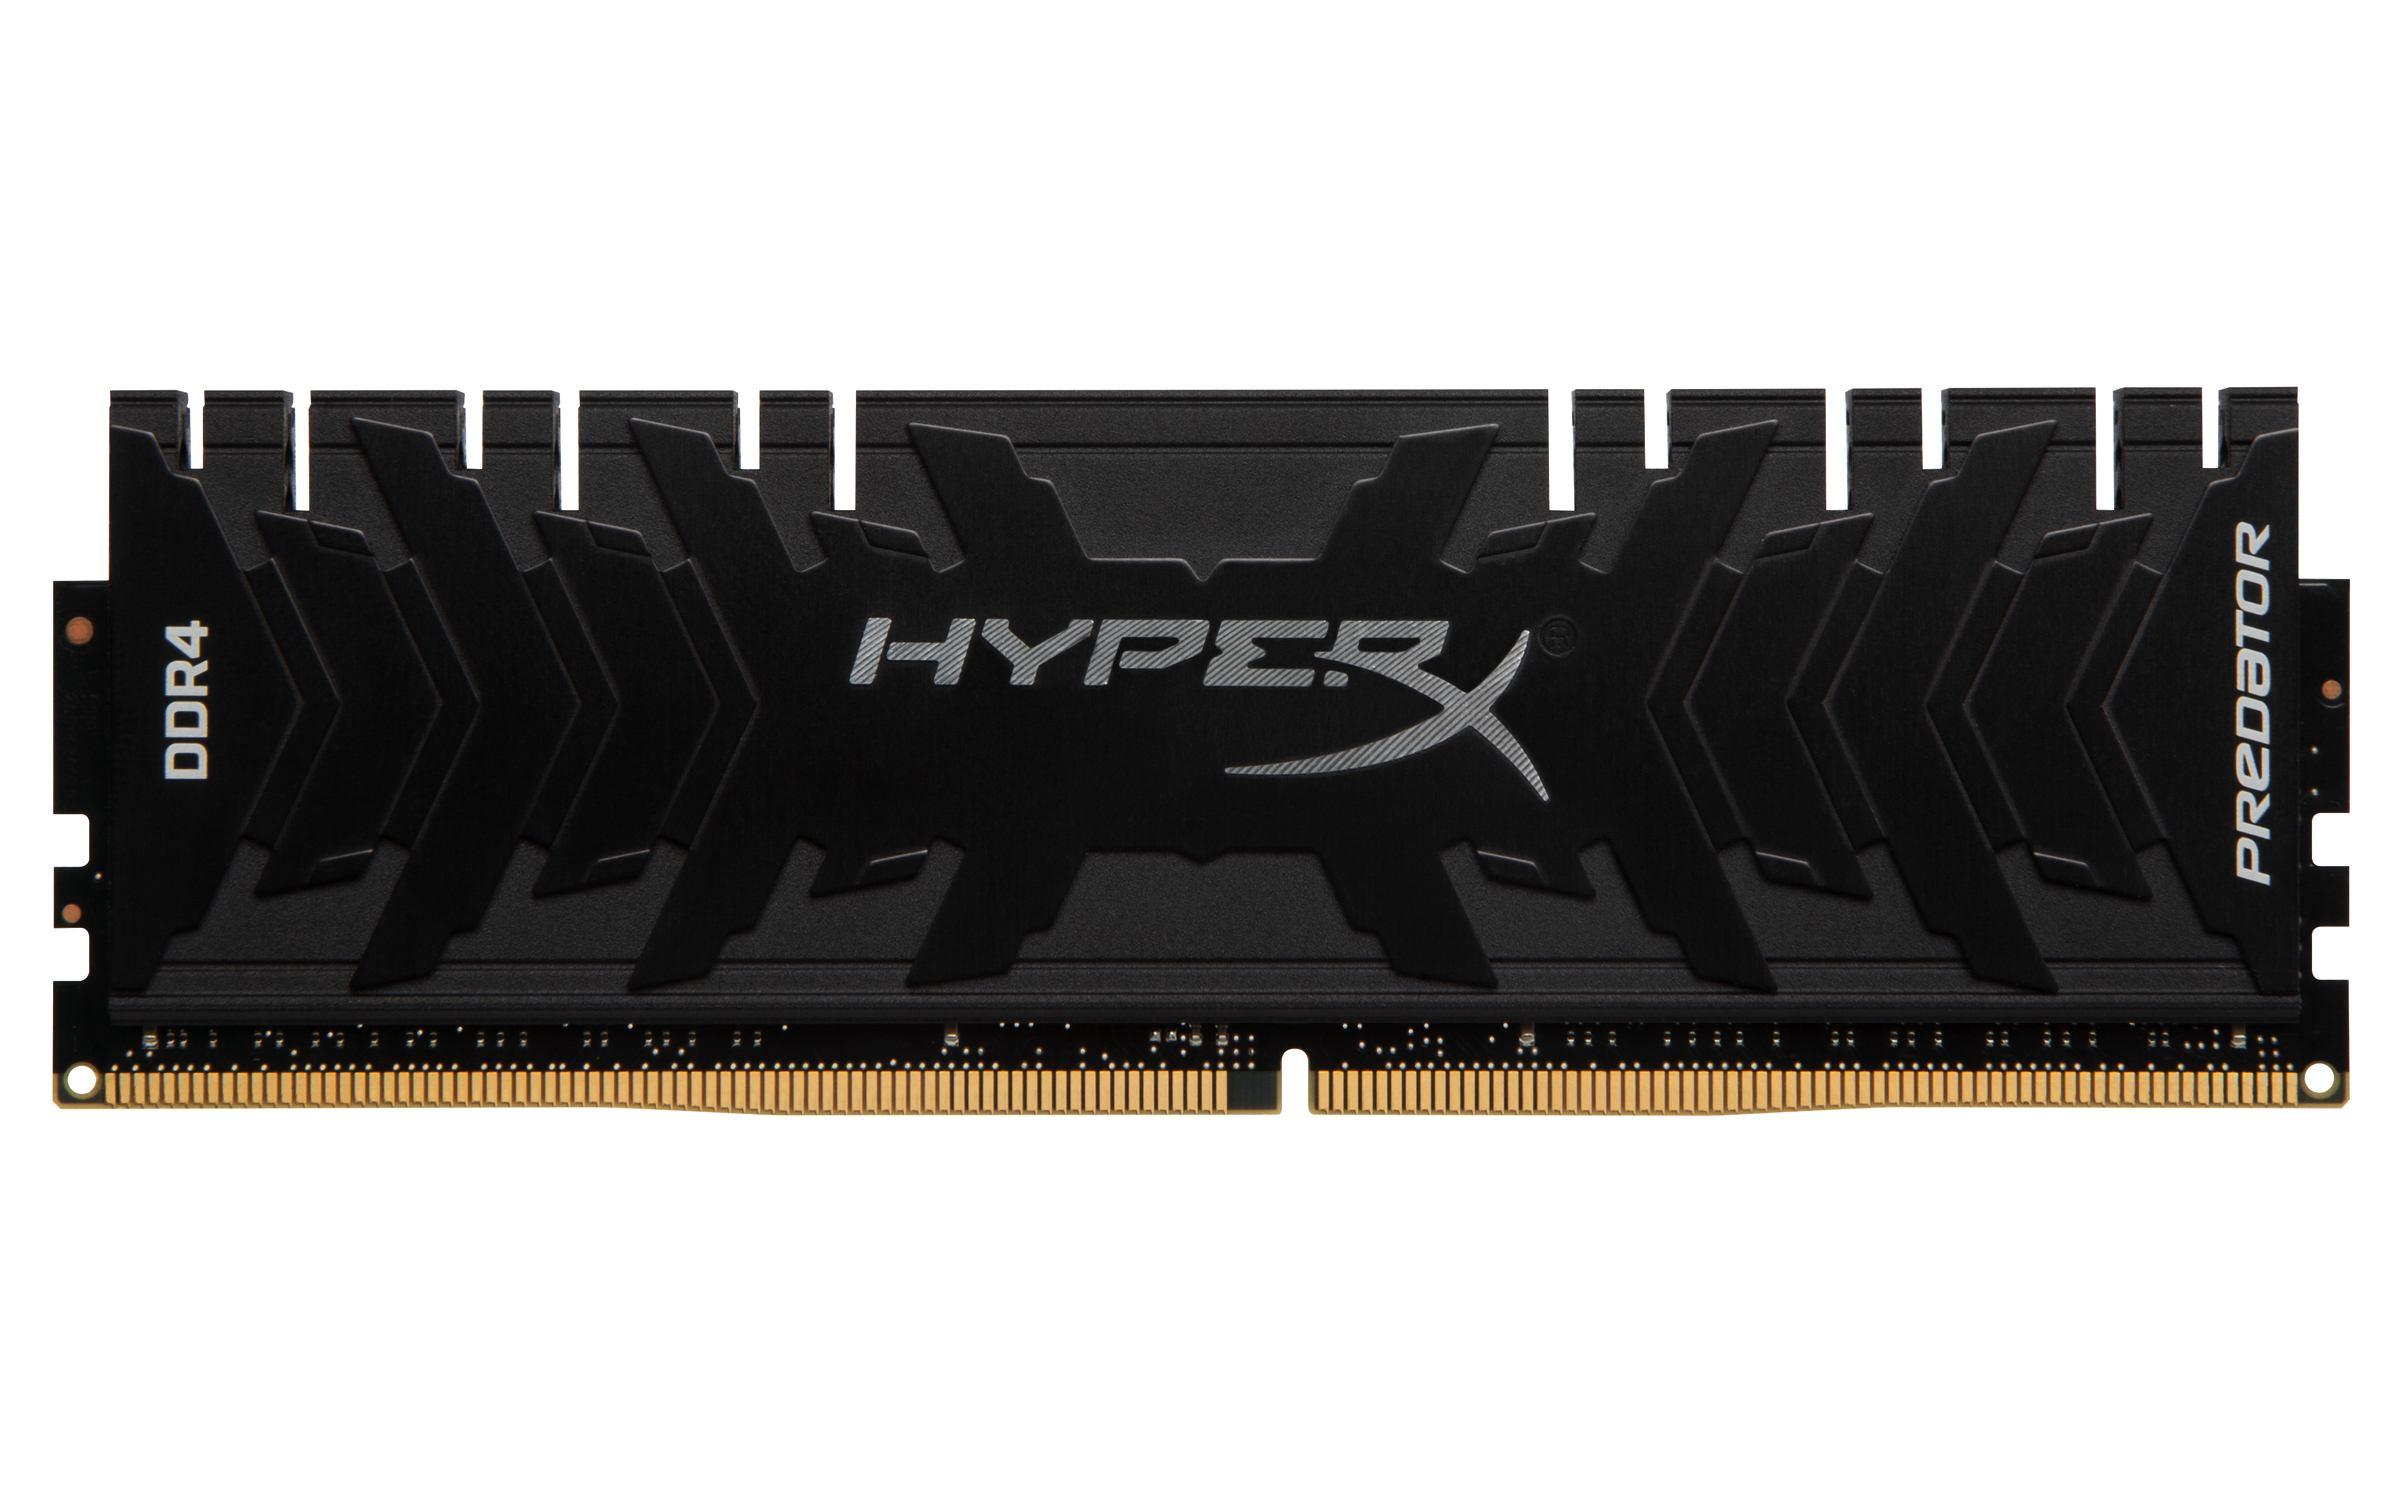 2022274-HyperX-Predator-HX424C12PB3K2-16-memoria-16-GB-DDR4-2400-MHz-HyperX-Pre